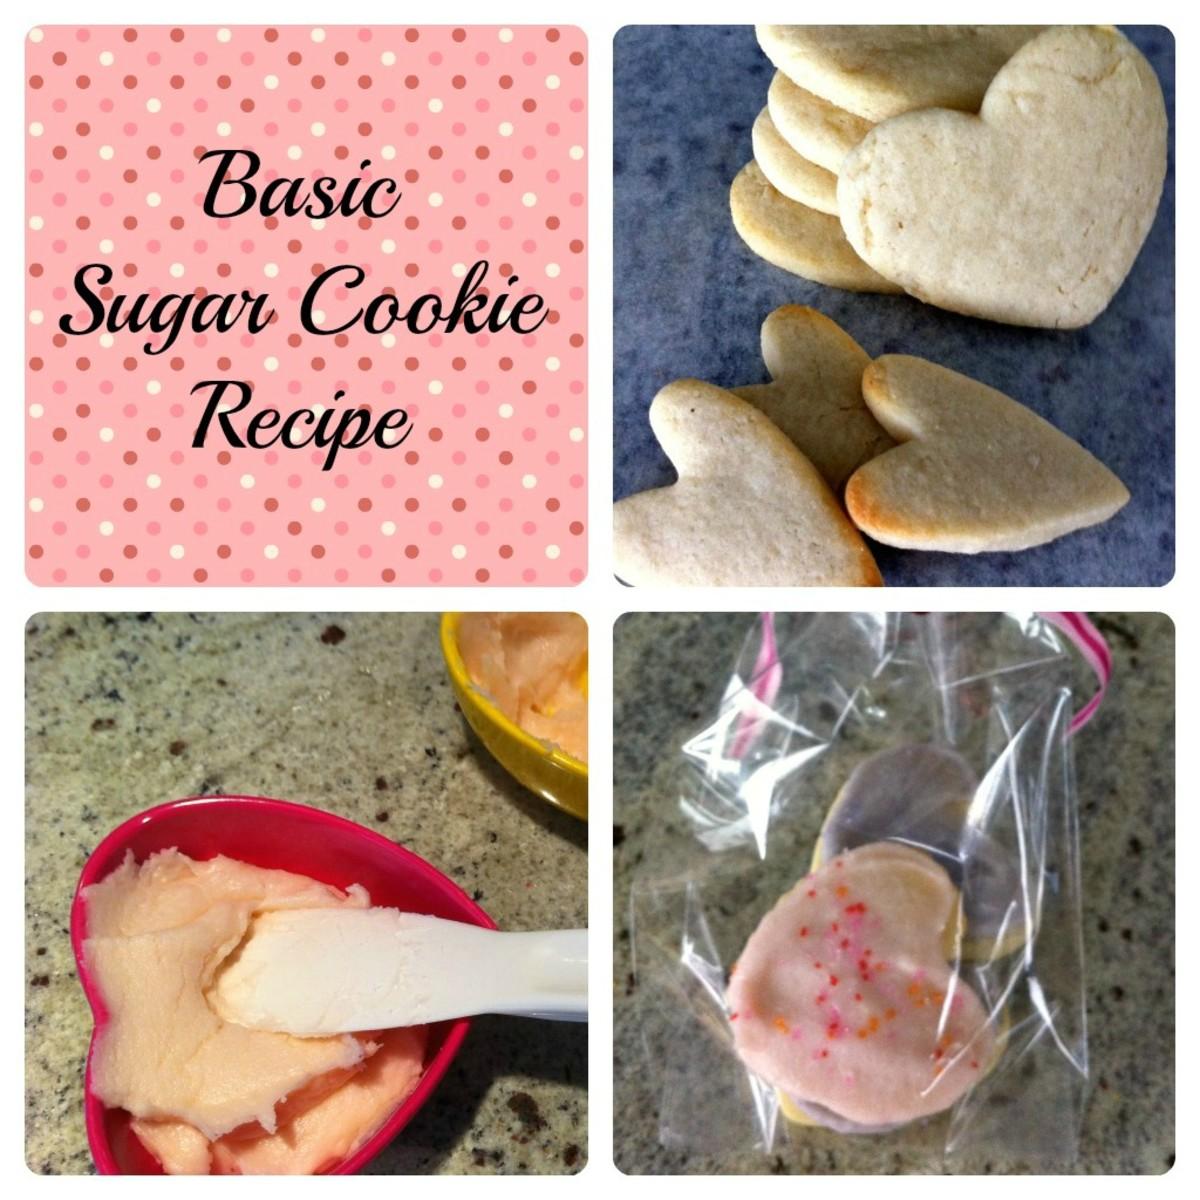 Basic Sugar Cookie Recipe - Steps